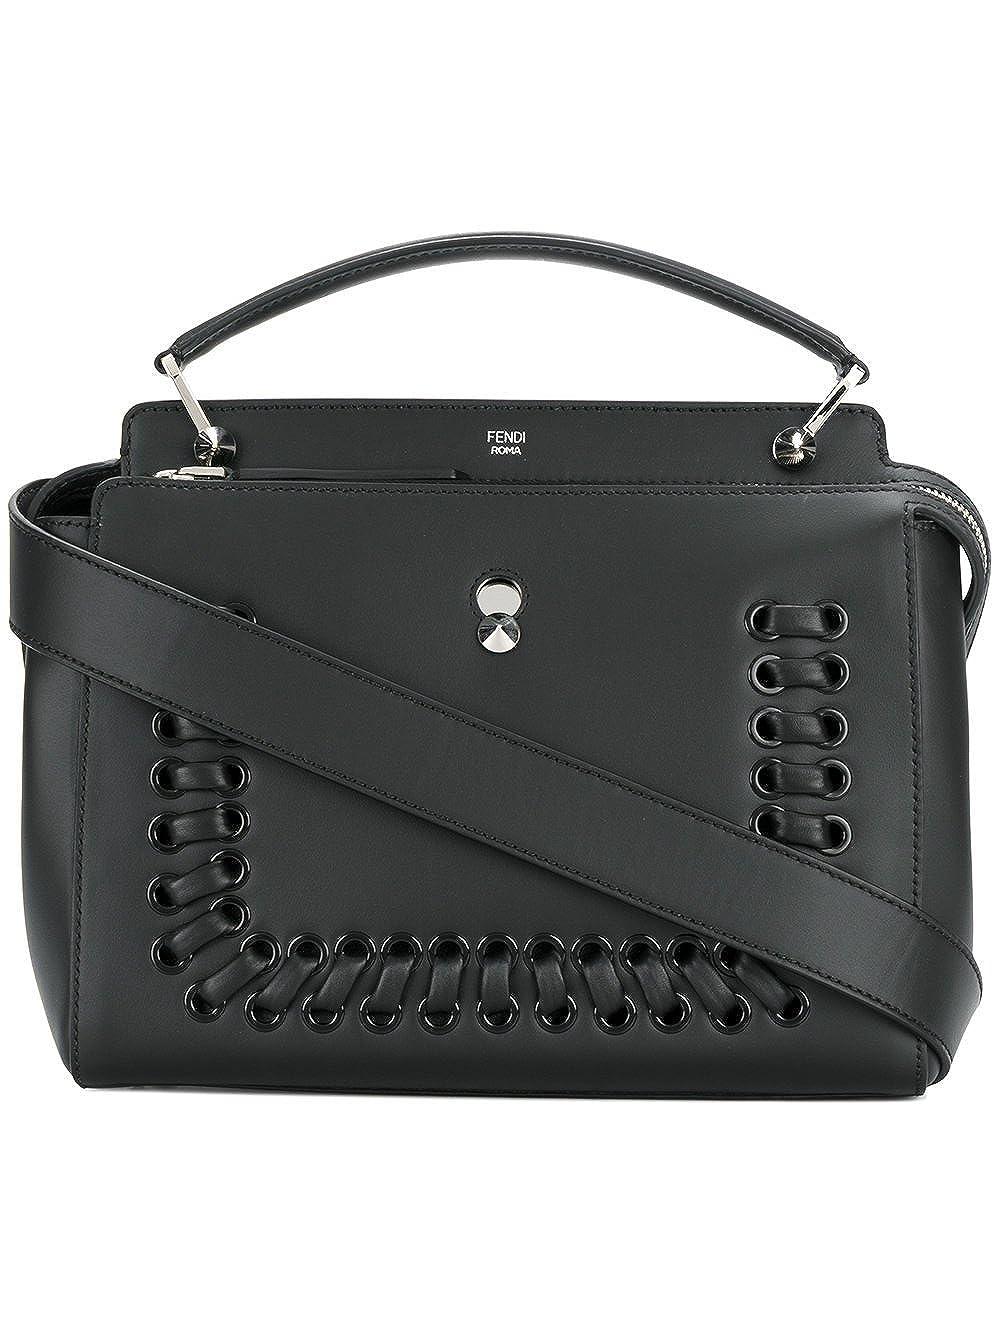 Fendi Women s 8Bn2937fvf0gxn Black Leather Handbag  Amazon.co.uk  Clothing 0d5a4a983f